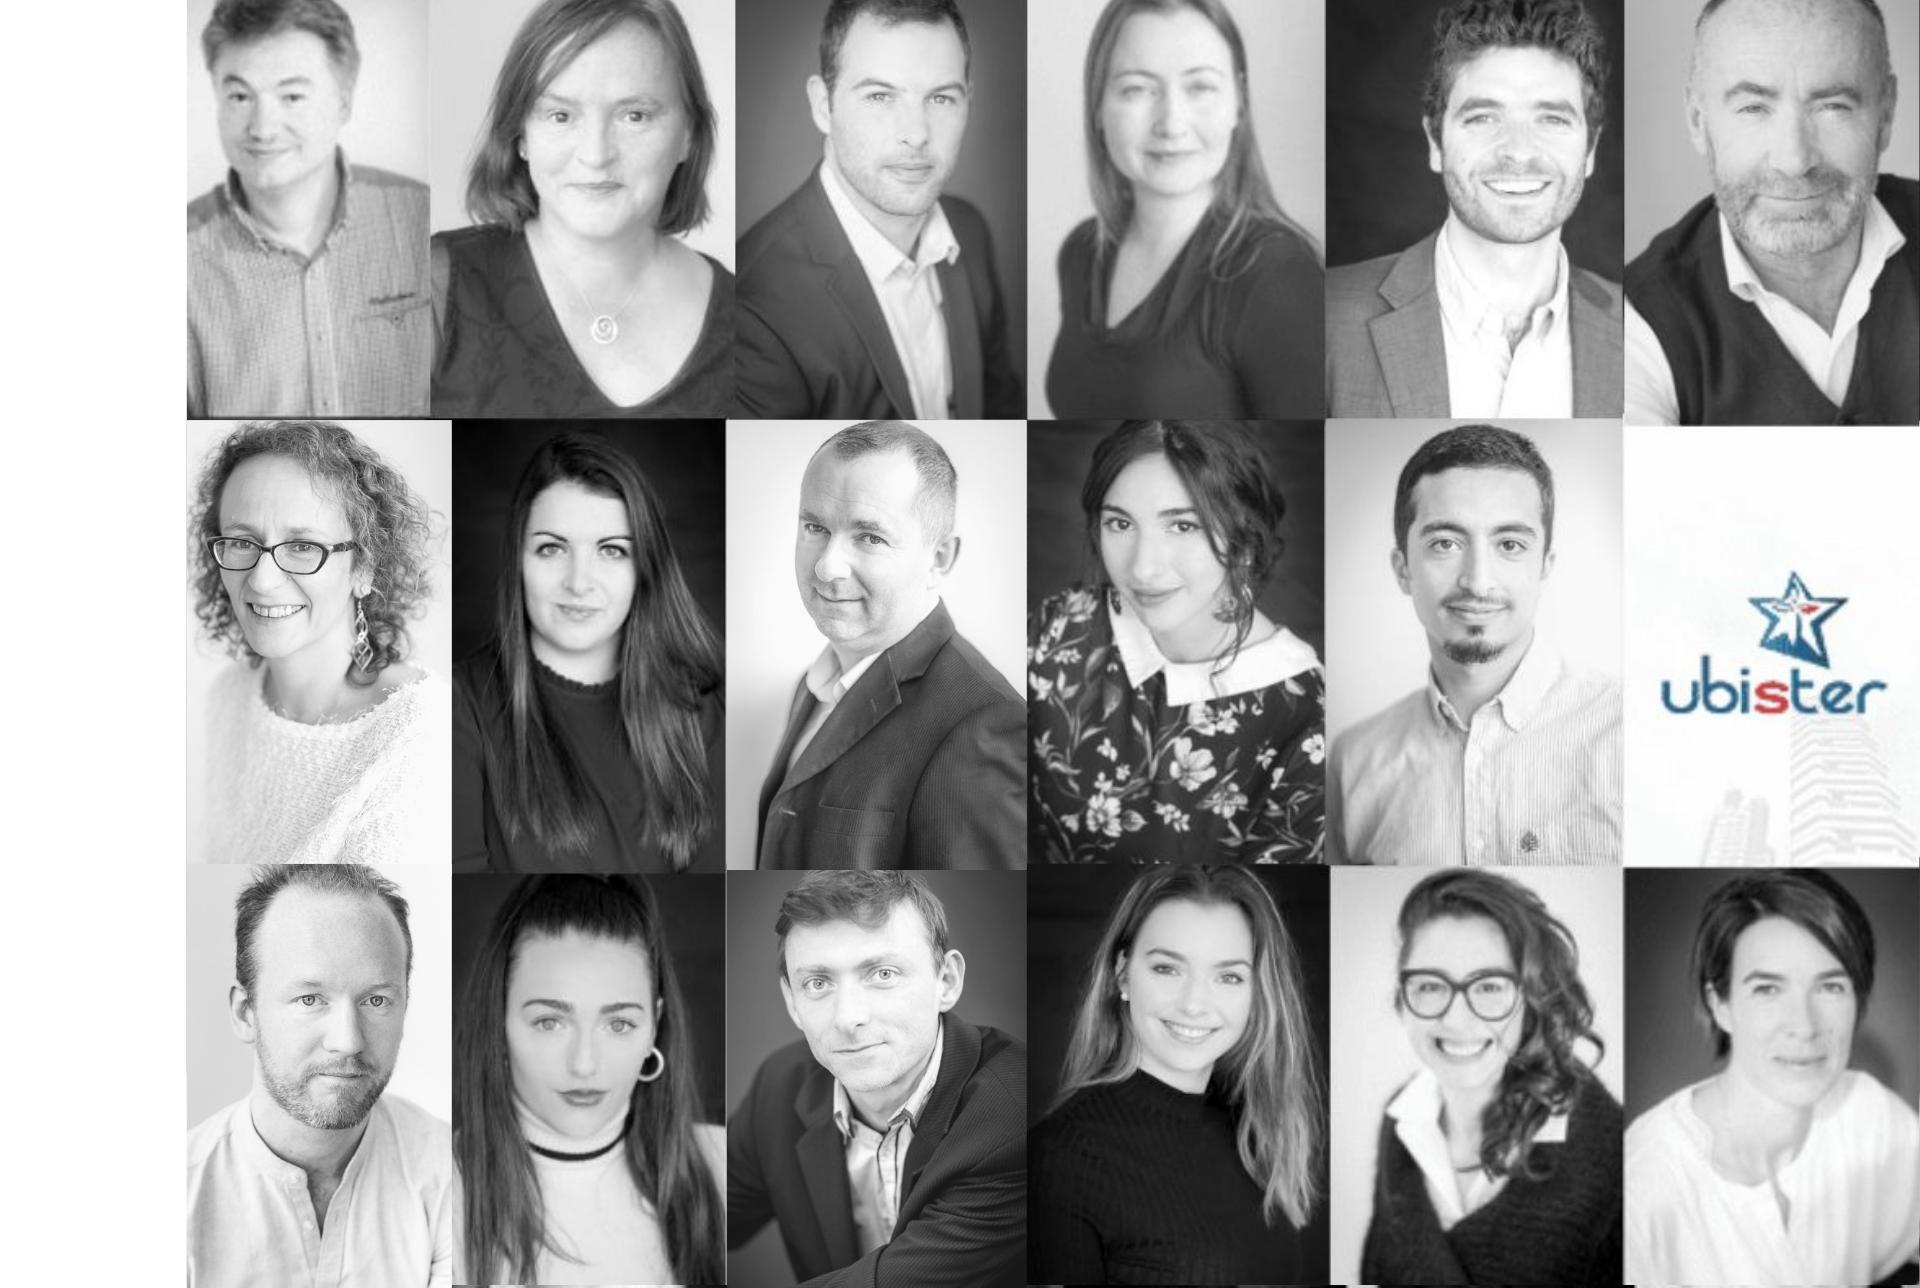 Ubister : 1er partenaire cloud français avec SAP Business ByDesign